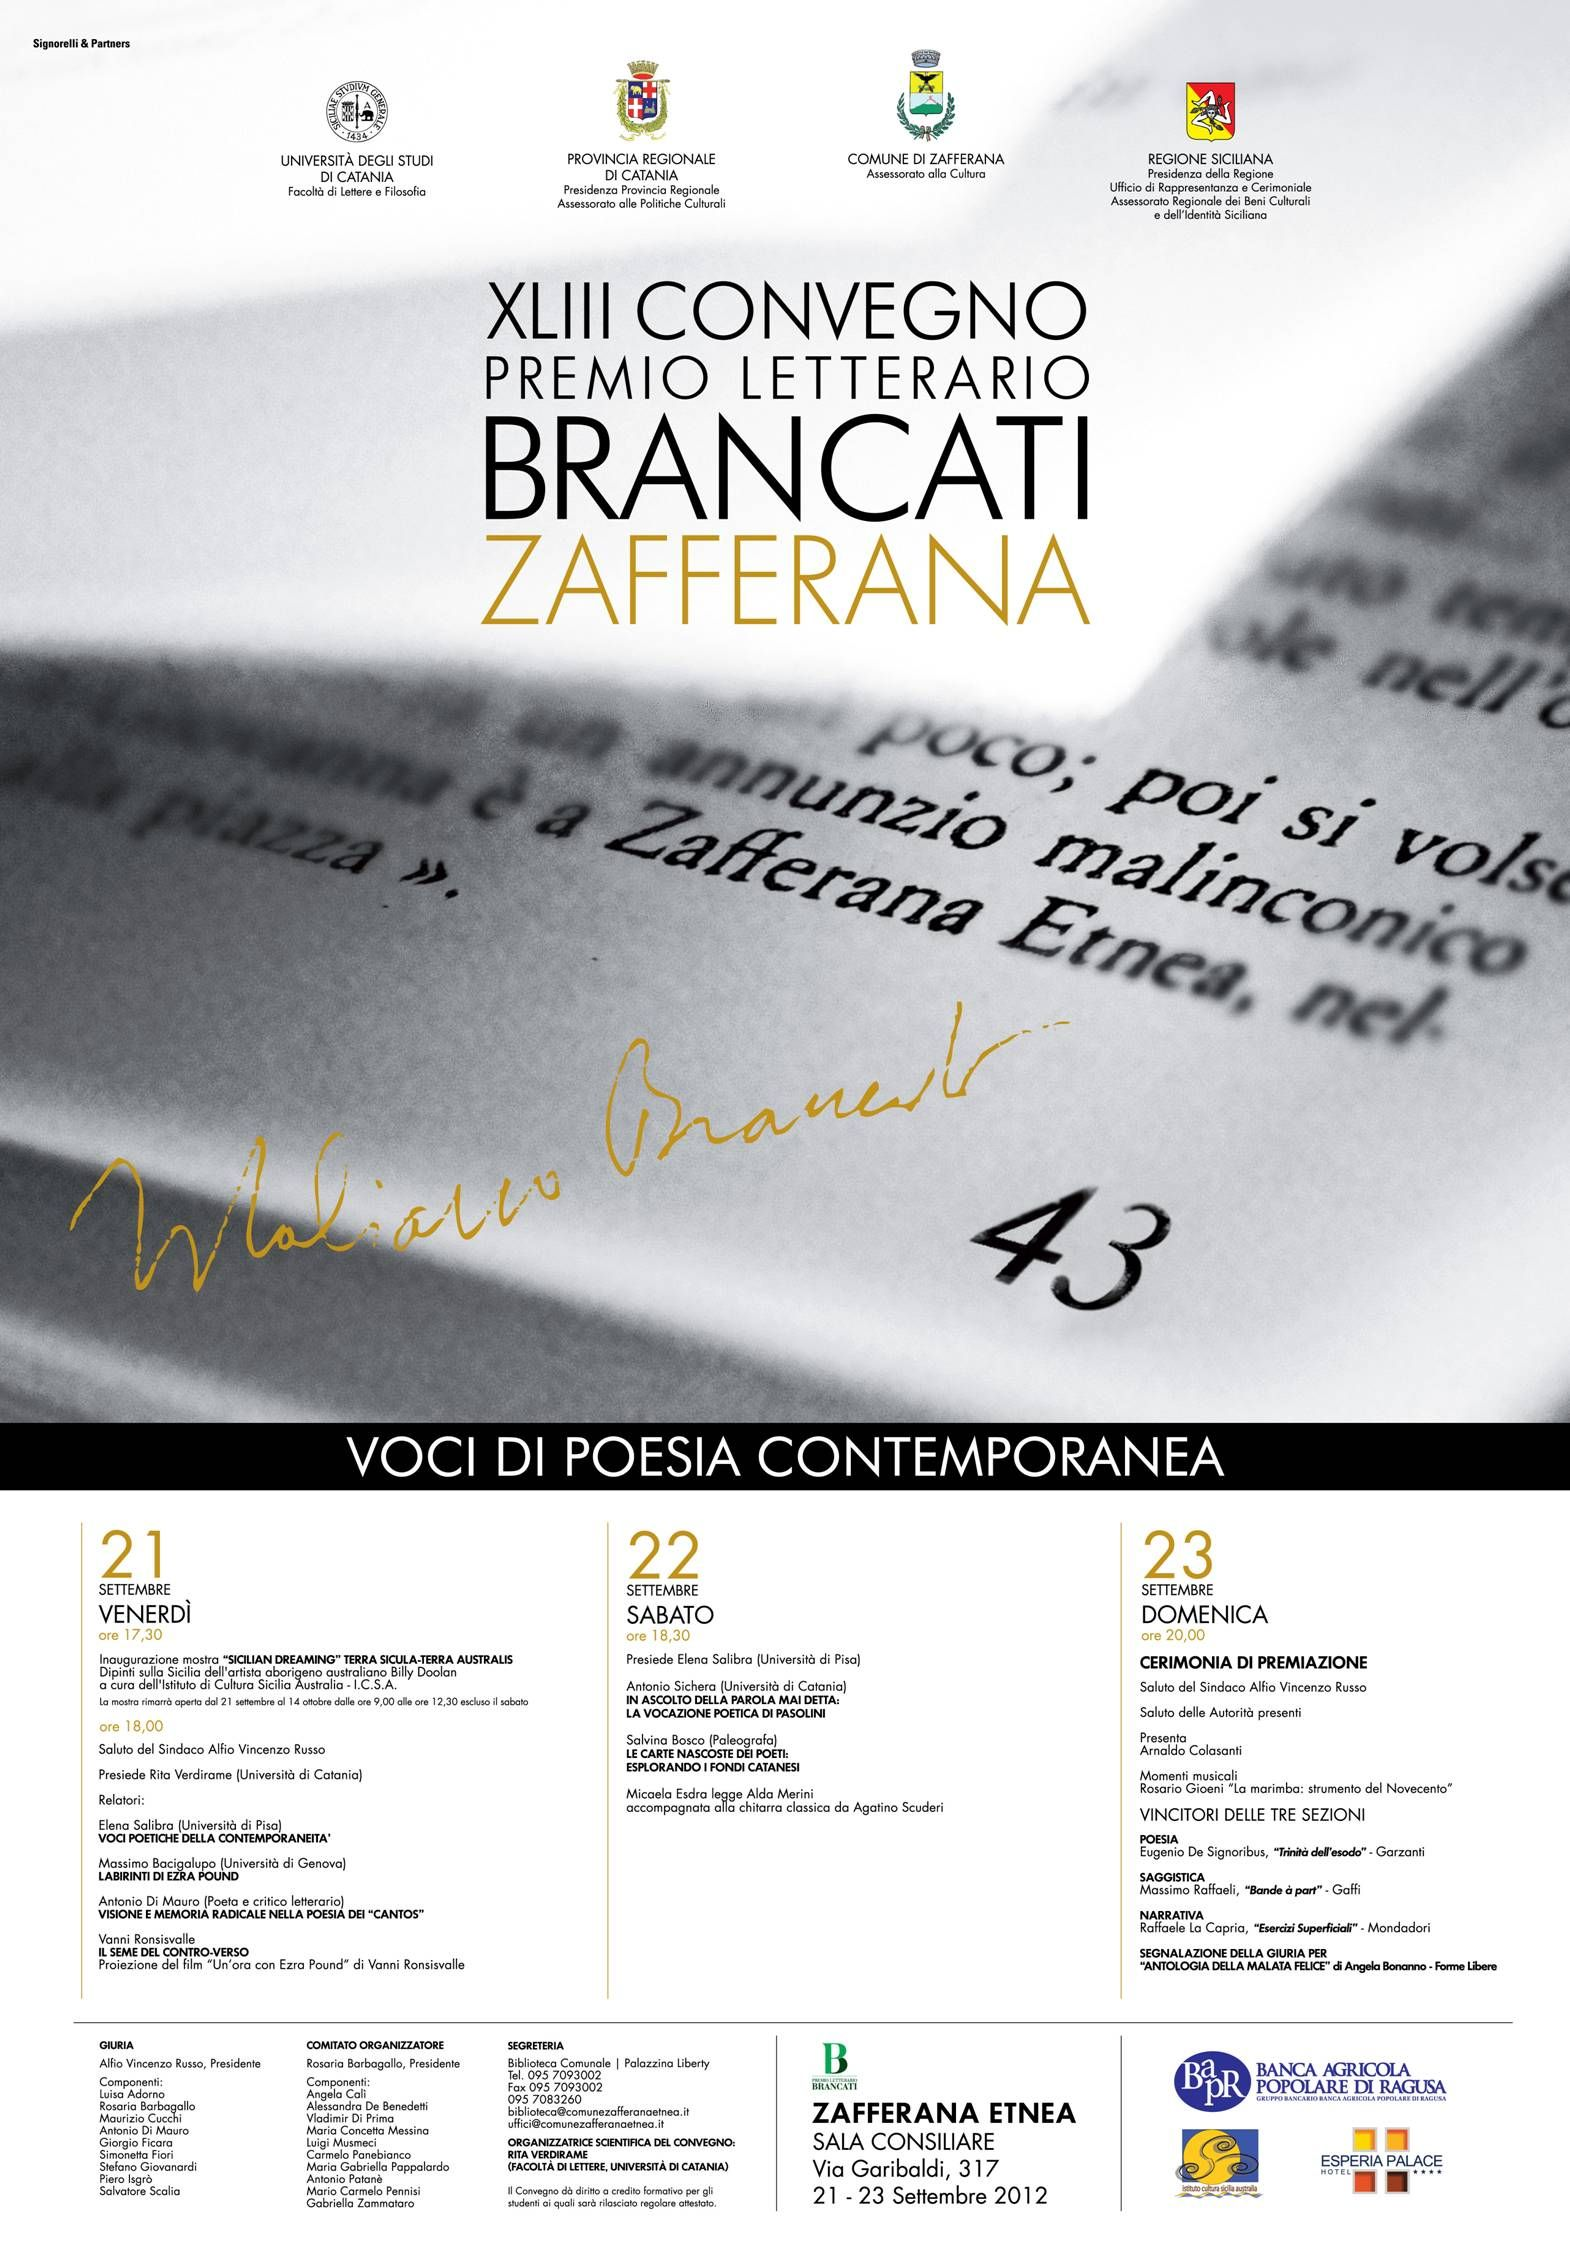 10+ Banca agricola di ragusa catania ideas in 2021